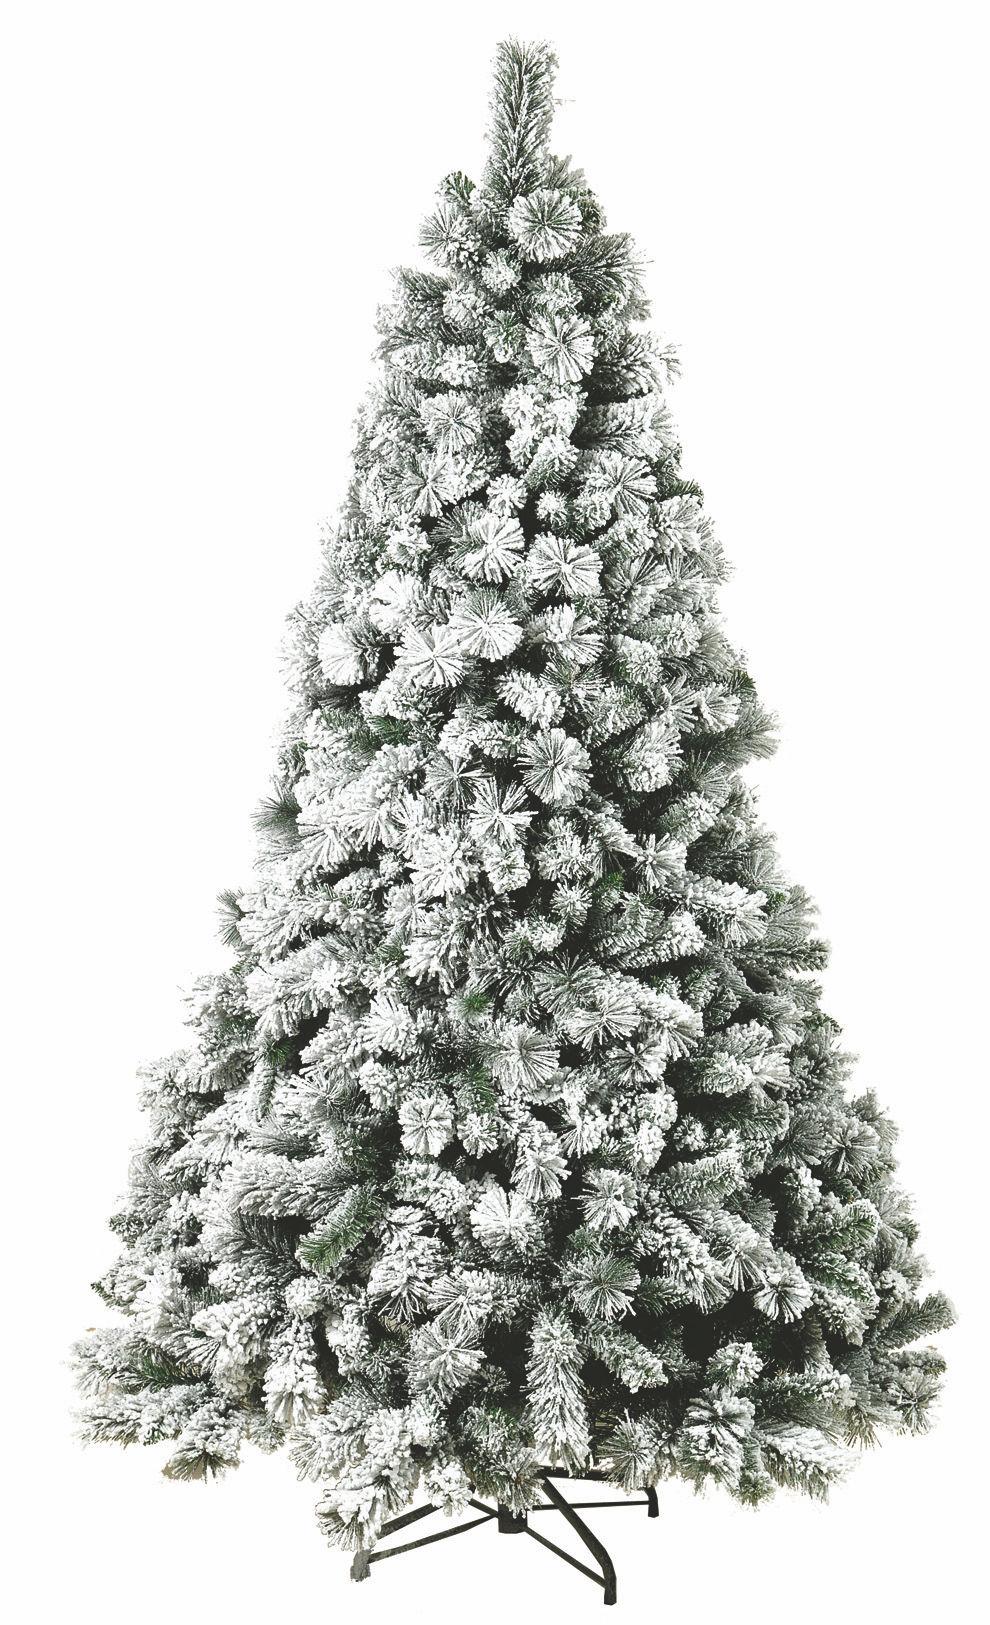 afb7fa245464 Χριστουγεννιάτικα Δέντρα - Βάσεις online στις Χαμηλότερες Τιμές Λιανός